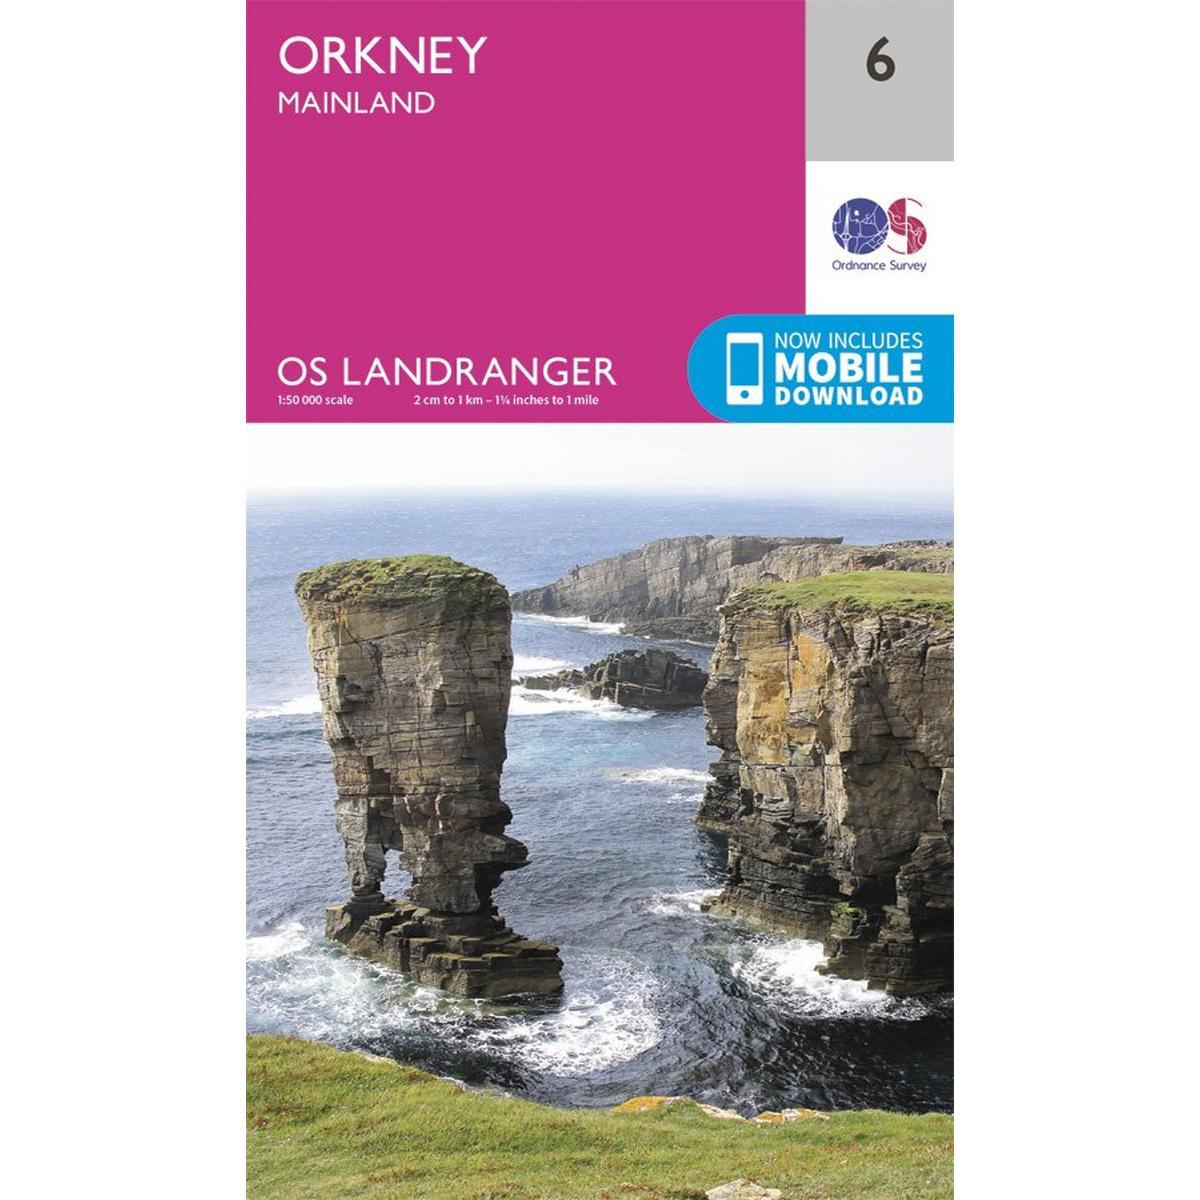 Ordnance Survey OS Landranger Map 06 Orkney - Mainland